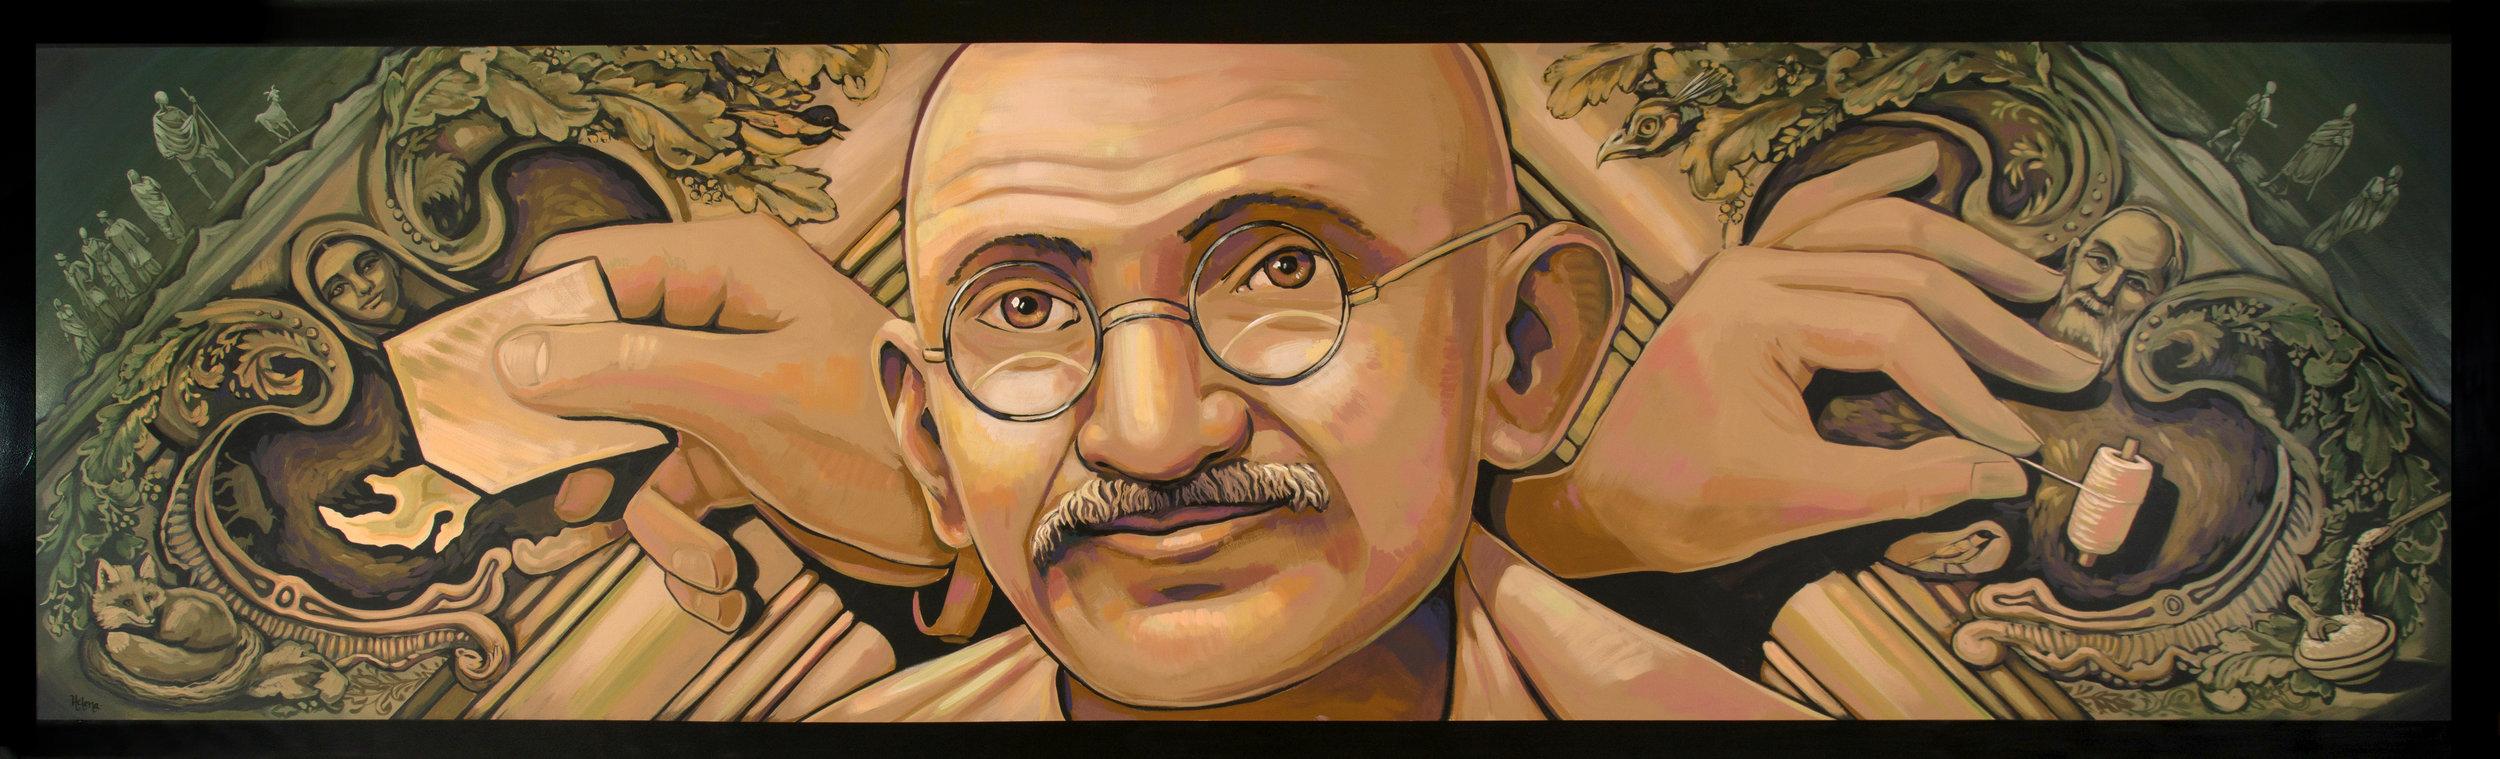 Gandhi Mural Cropped Professional.jpg